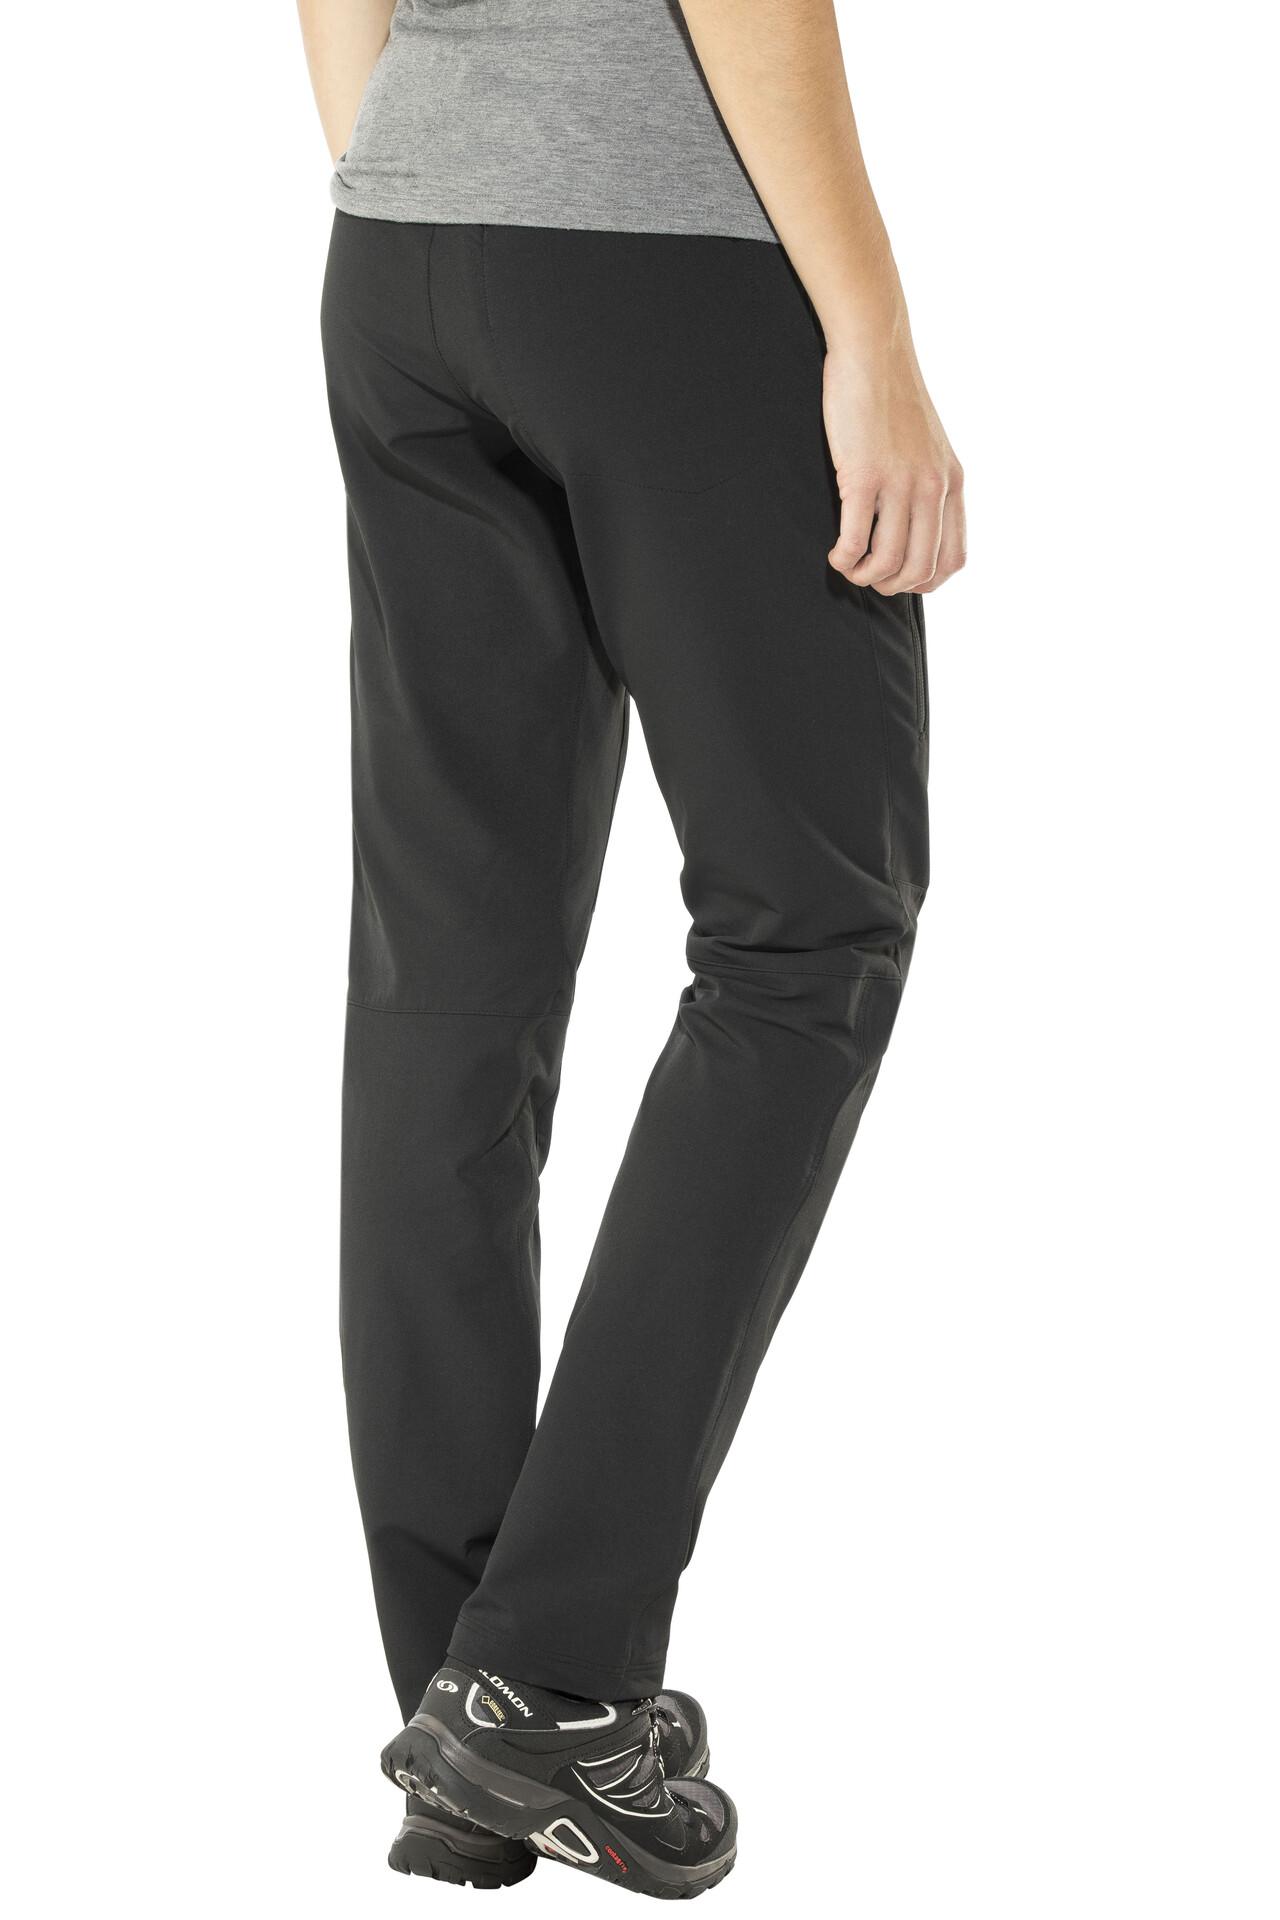 Outdoor Ii MujerBlack Ld Millet Pantalones Ajq5RL34